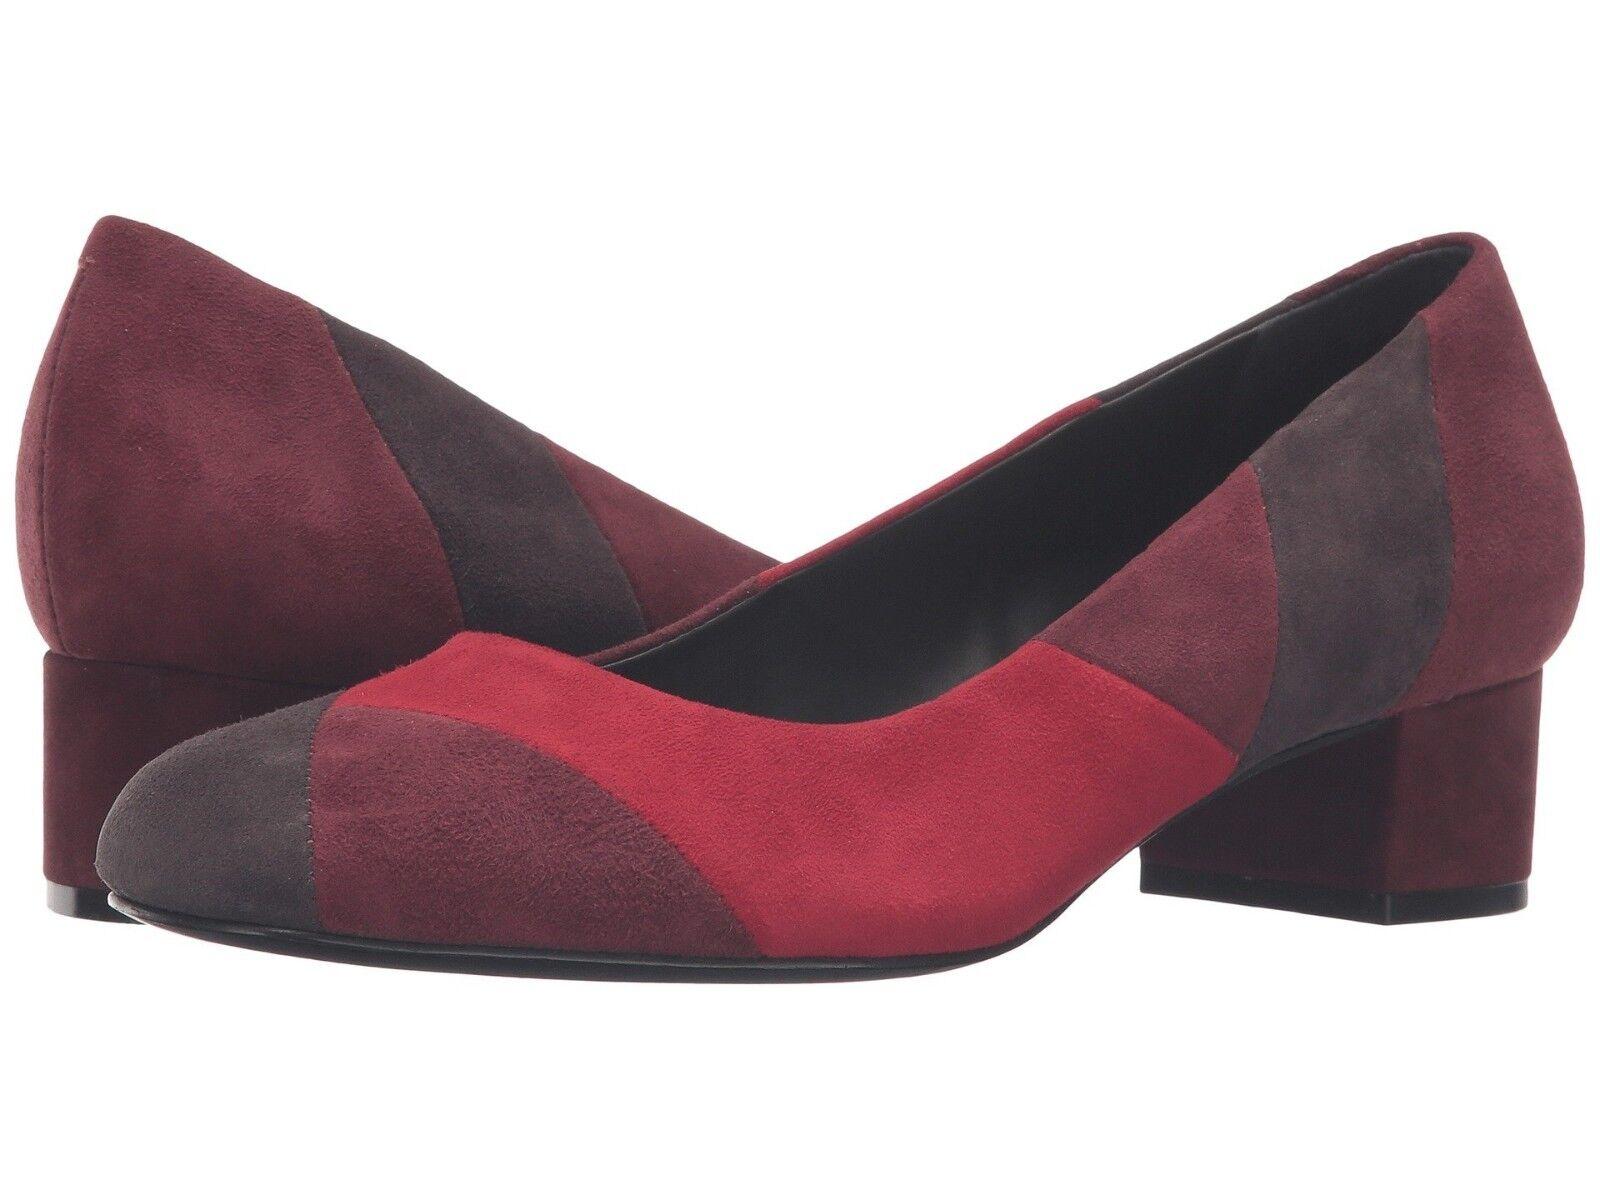 Bernardo Women's Roxanne Suede Heels Pumps Retail  168 size 8.5